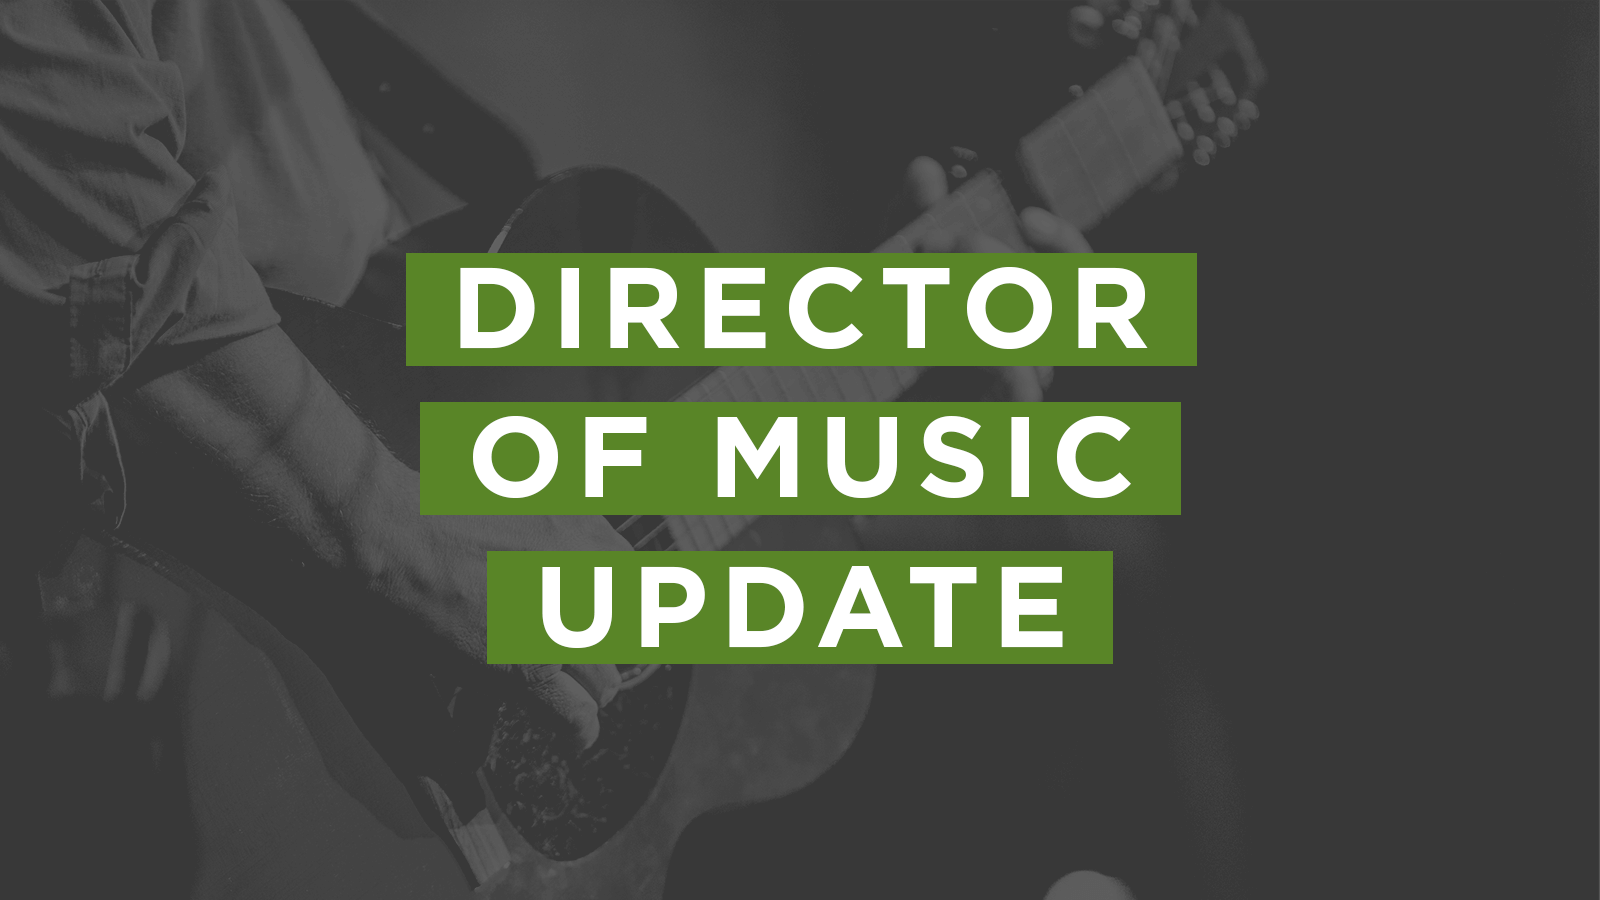 DirectorofMusicUpdate.png